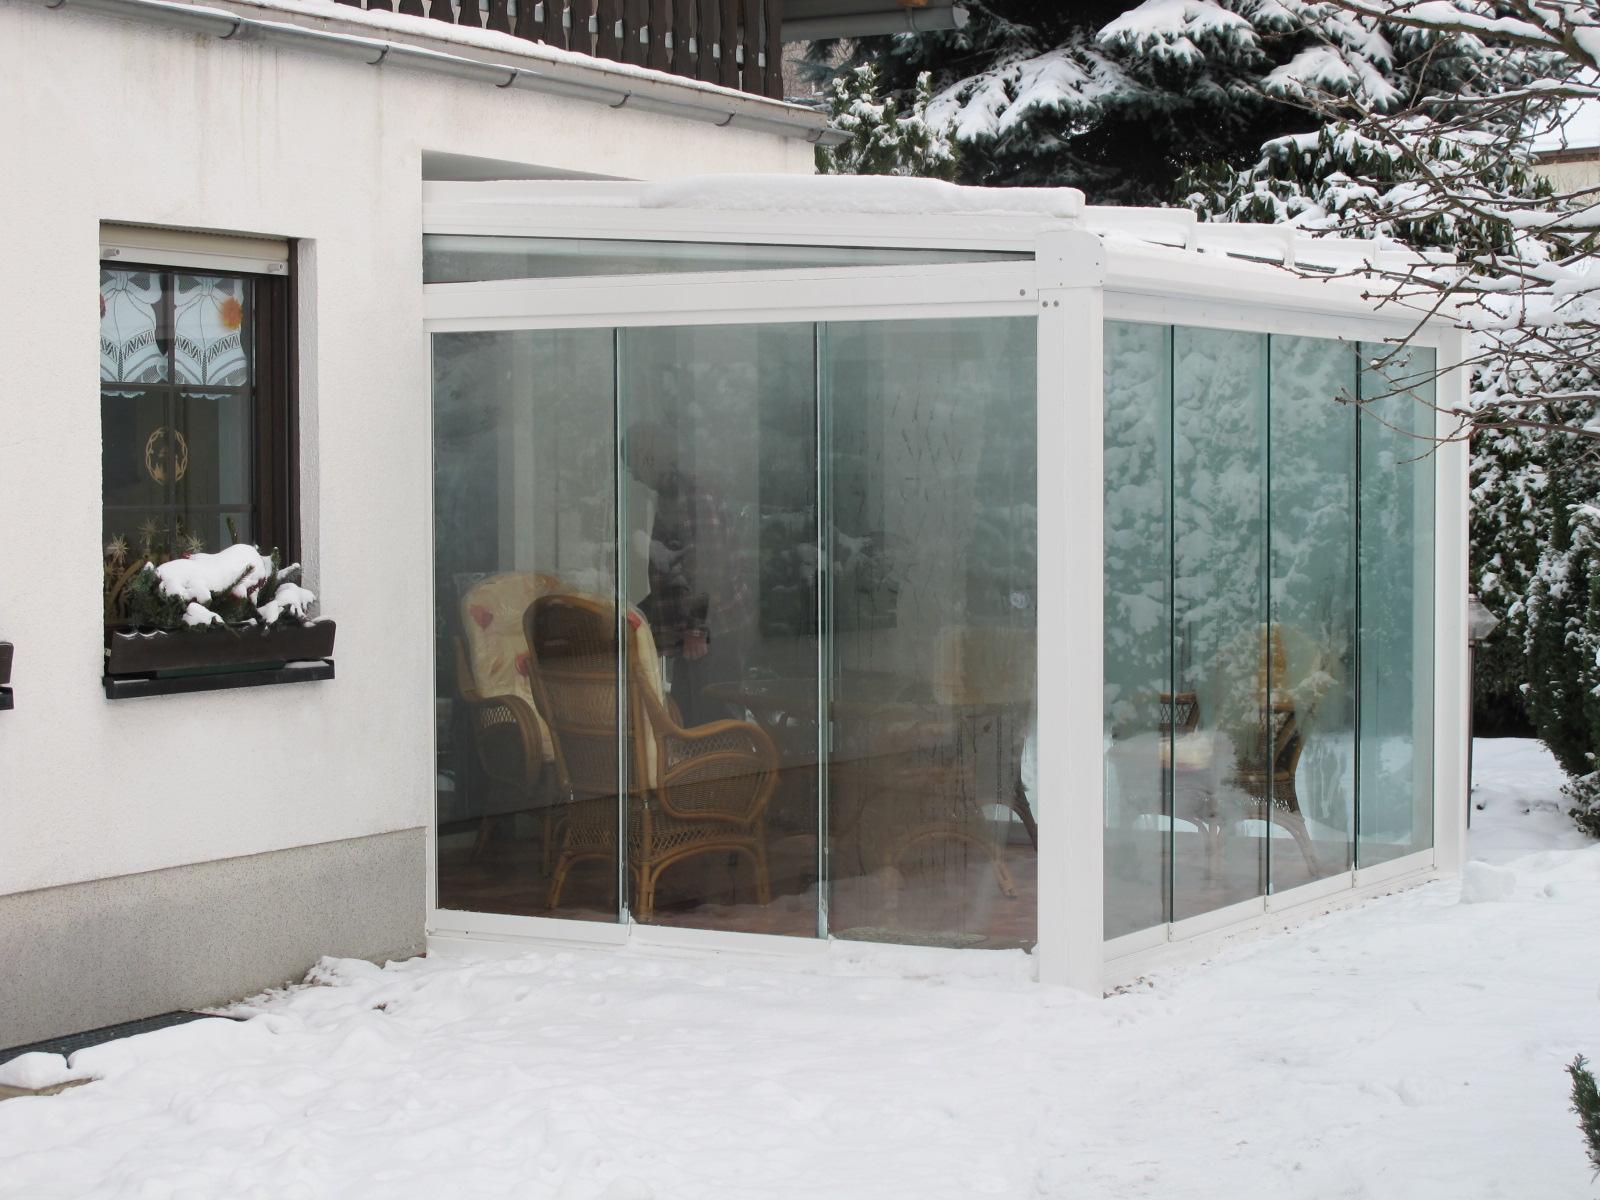 Spezialist Fur Den Bau Moderner Wintergarten Kwozalla Firmengruppe